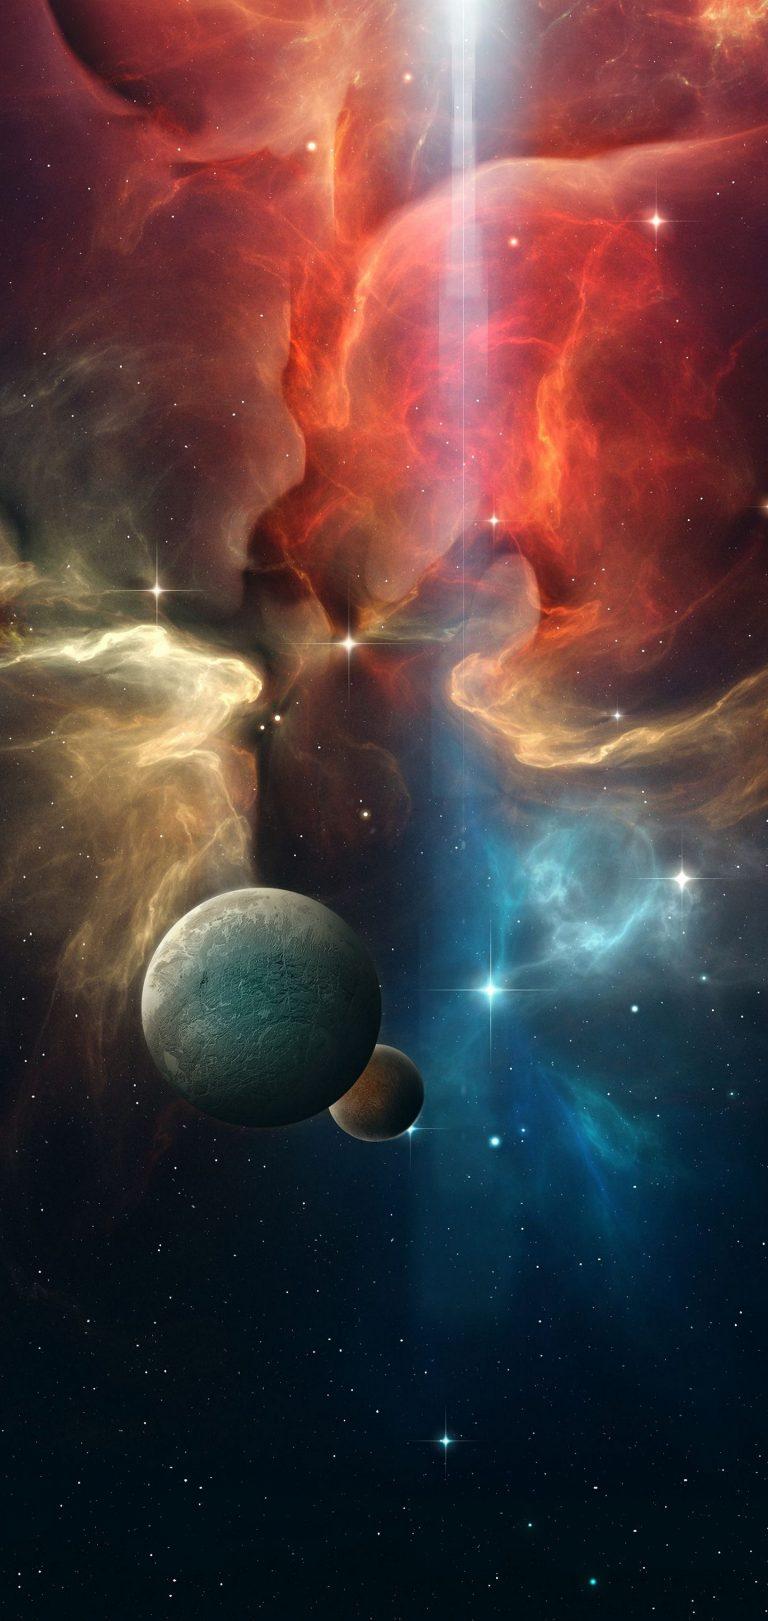 Multicolor Space Planet Wallpaper 1440x3040 768x1621